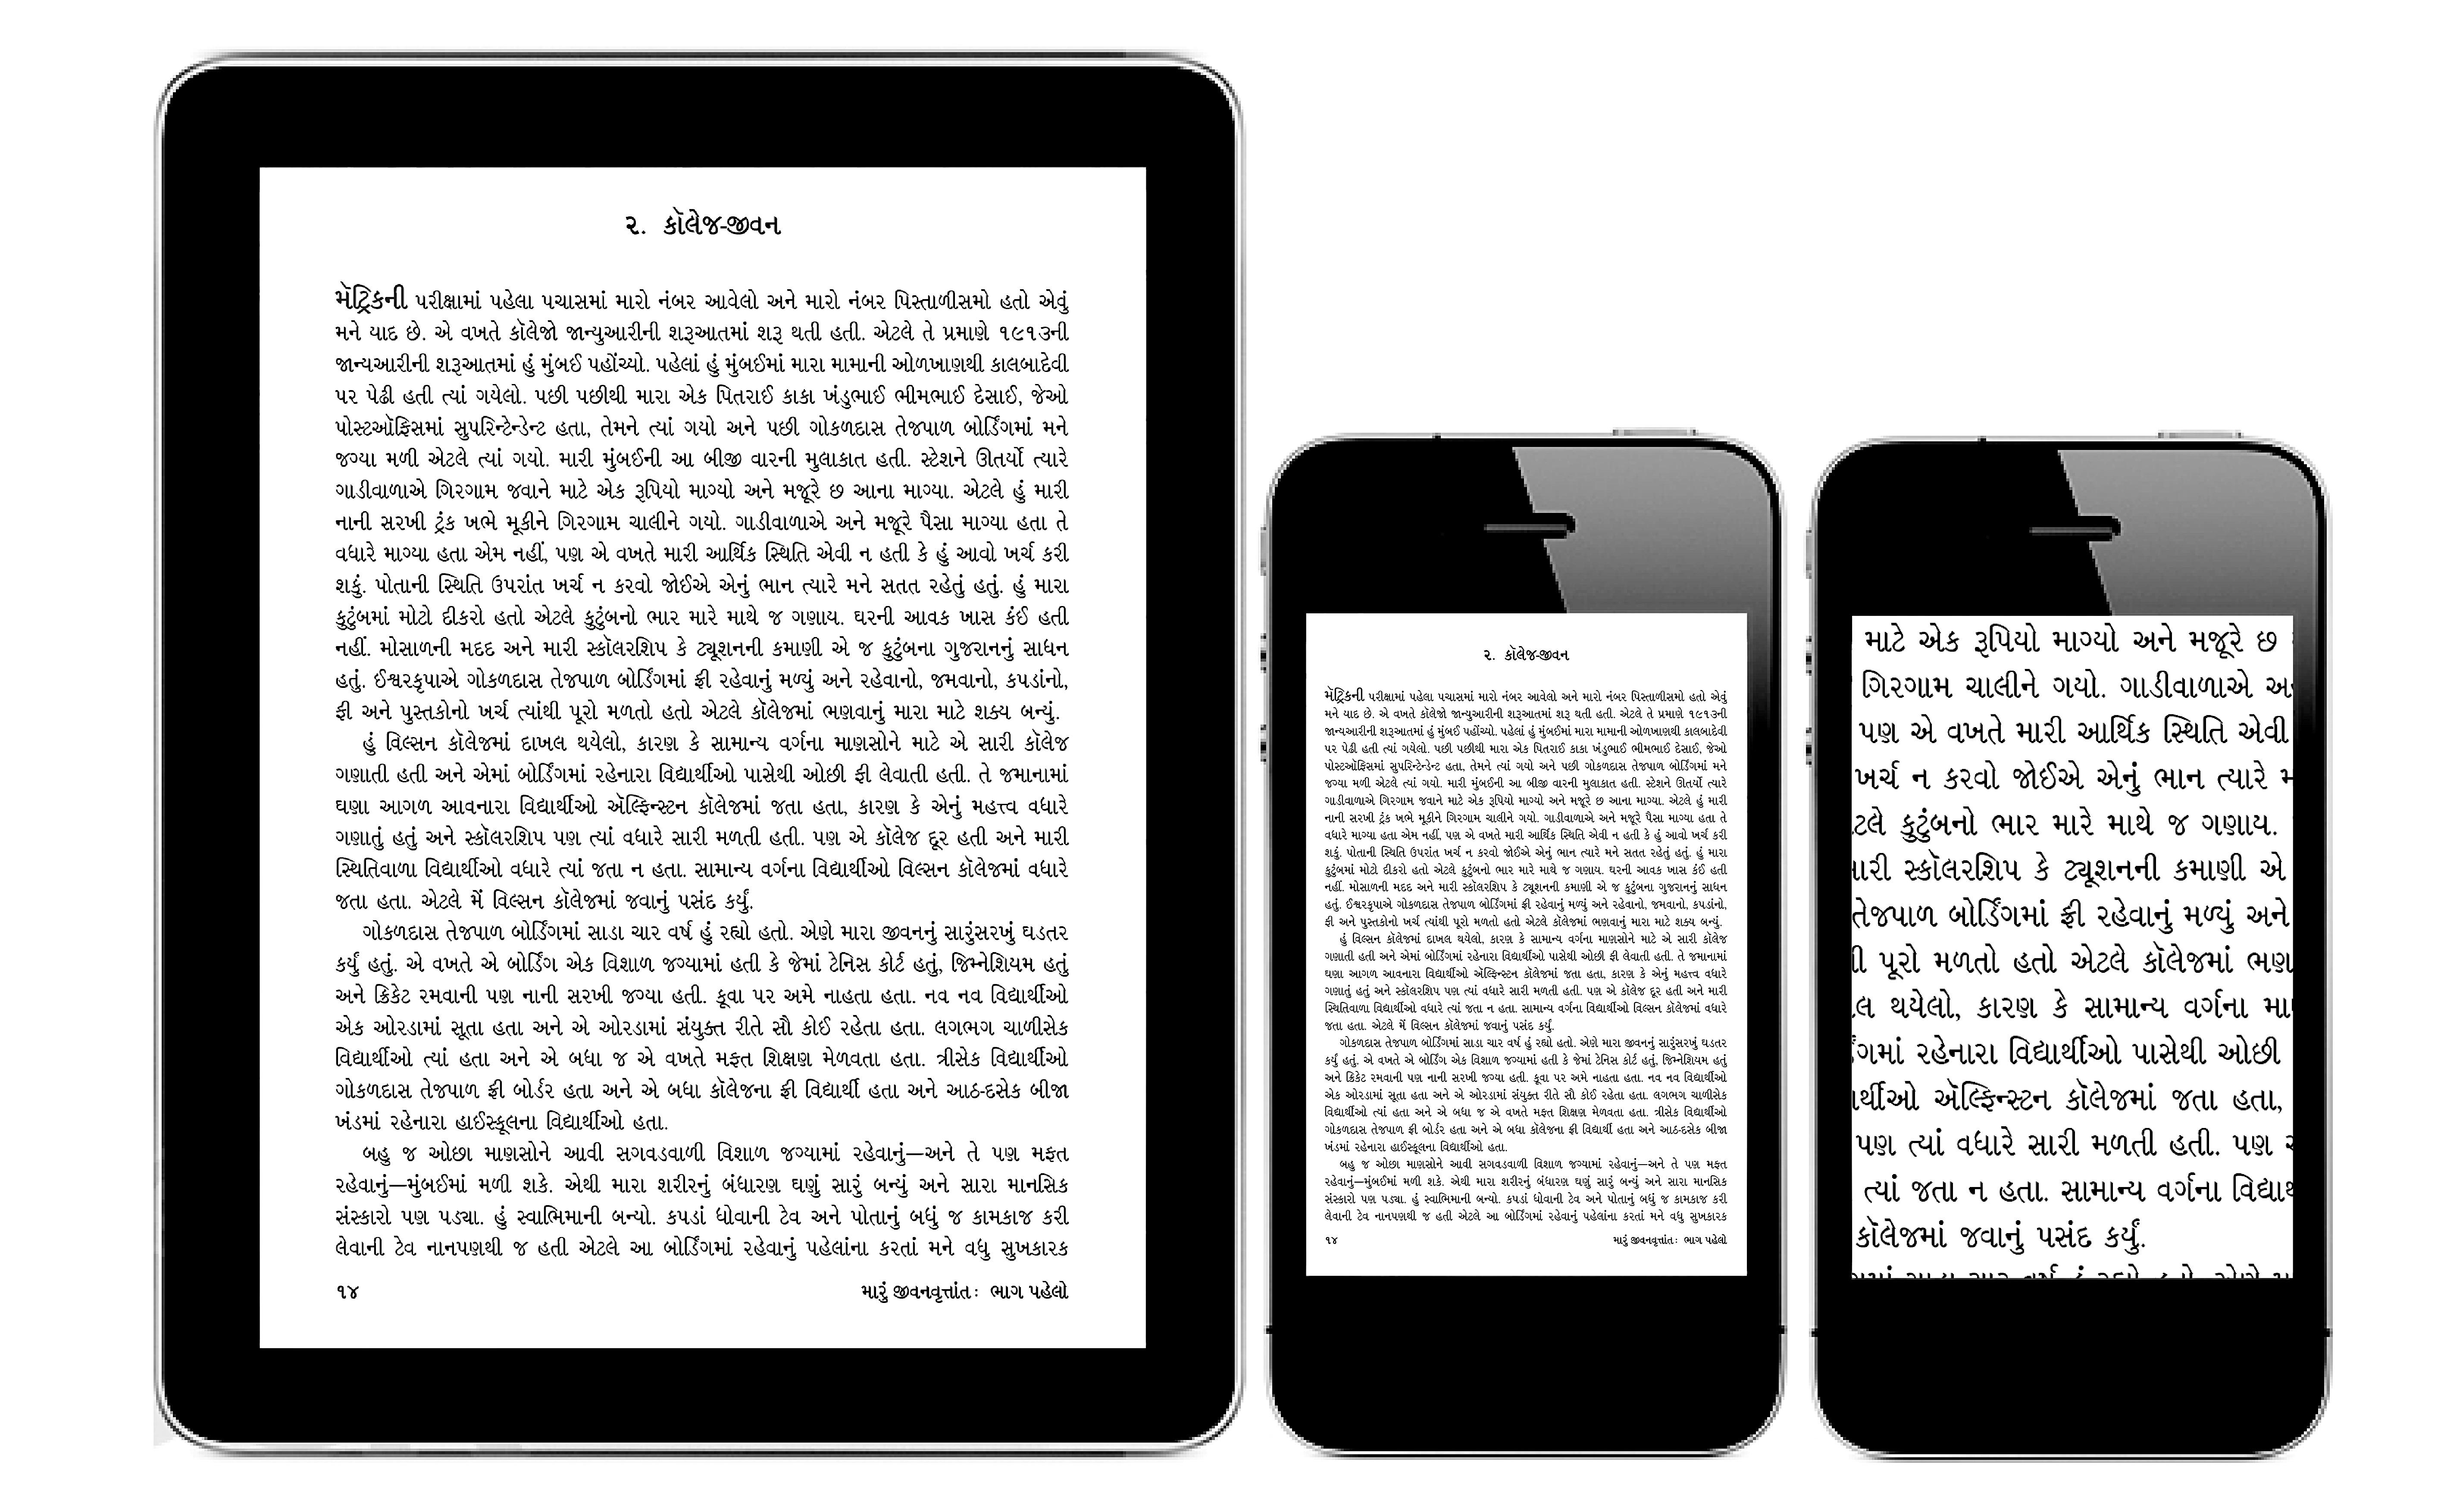 PDF Format: છાપેલાં પુસ્તકનાં પાનાંની pdf ફાઇલ ને ઈ-બુક તરીકે વાંચતાં જો સાધન મોટું  હોય તો મૂળ પુસ્તકની નજીકનો અનુભવ થાય છે. પાનાંની ગોઠવણી, પાનાનંબર, રનિંગ હેડર-ફૂટર વગેરે જેમના તેમ જ રહે છે. પરંતુ જો ફોન જેવા નાના સાધનમાં વાંચવામાં આવે તો ટાઇપ ઘણા નાના લાગે... અને જો ઍન્લાર્જ કરીને જોવામાં આવે તો ફક્ત આખા પાનાનો થોડોક ભાગ જ જોઈ શકાય.